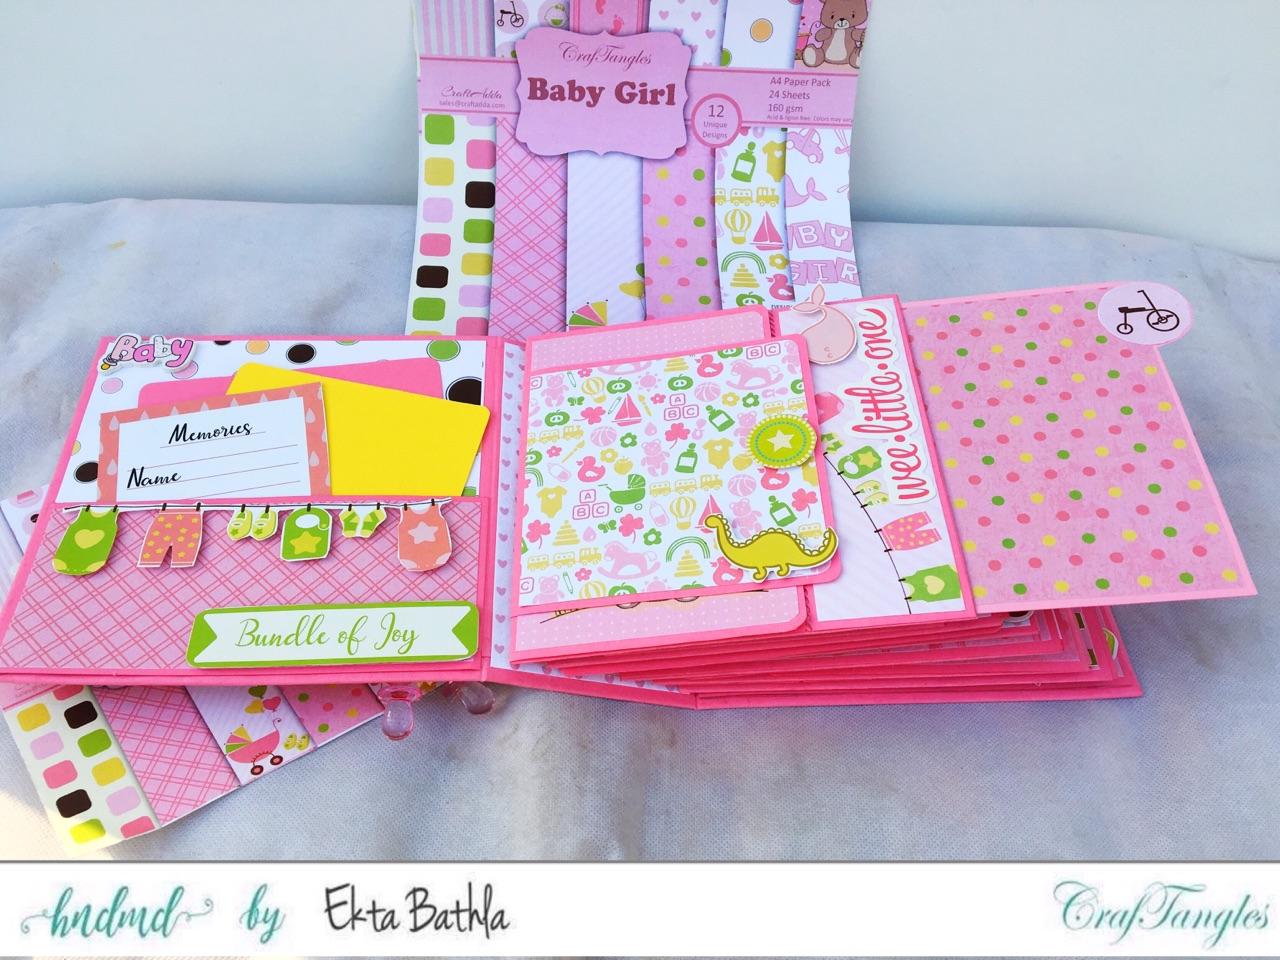 Baby Girl mini album showcasing Baby Girl Elements Pack by CrafTangles 11